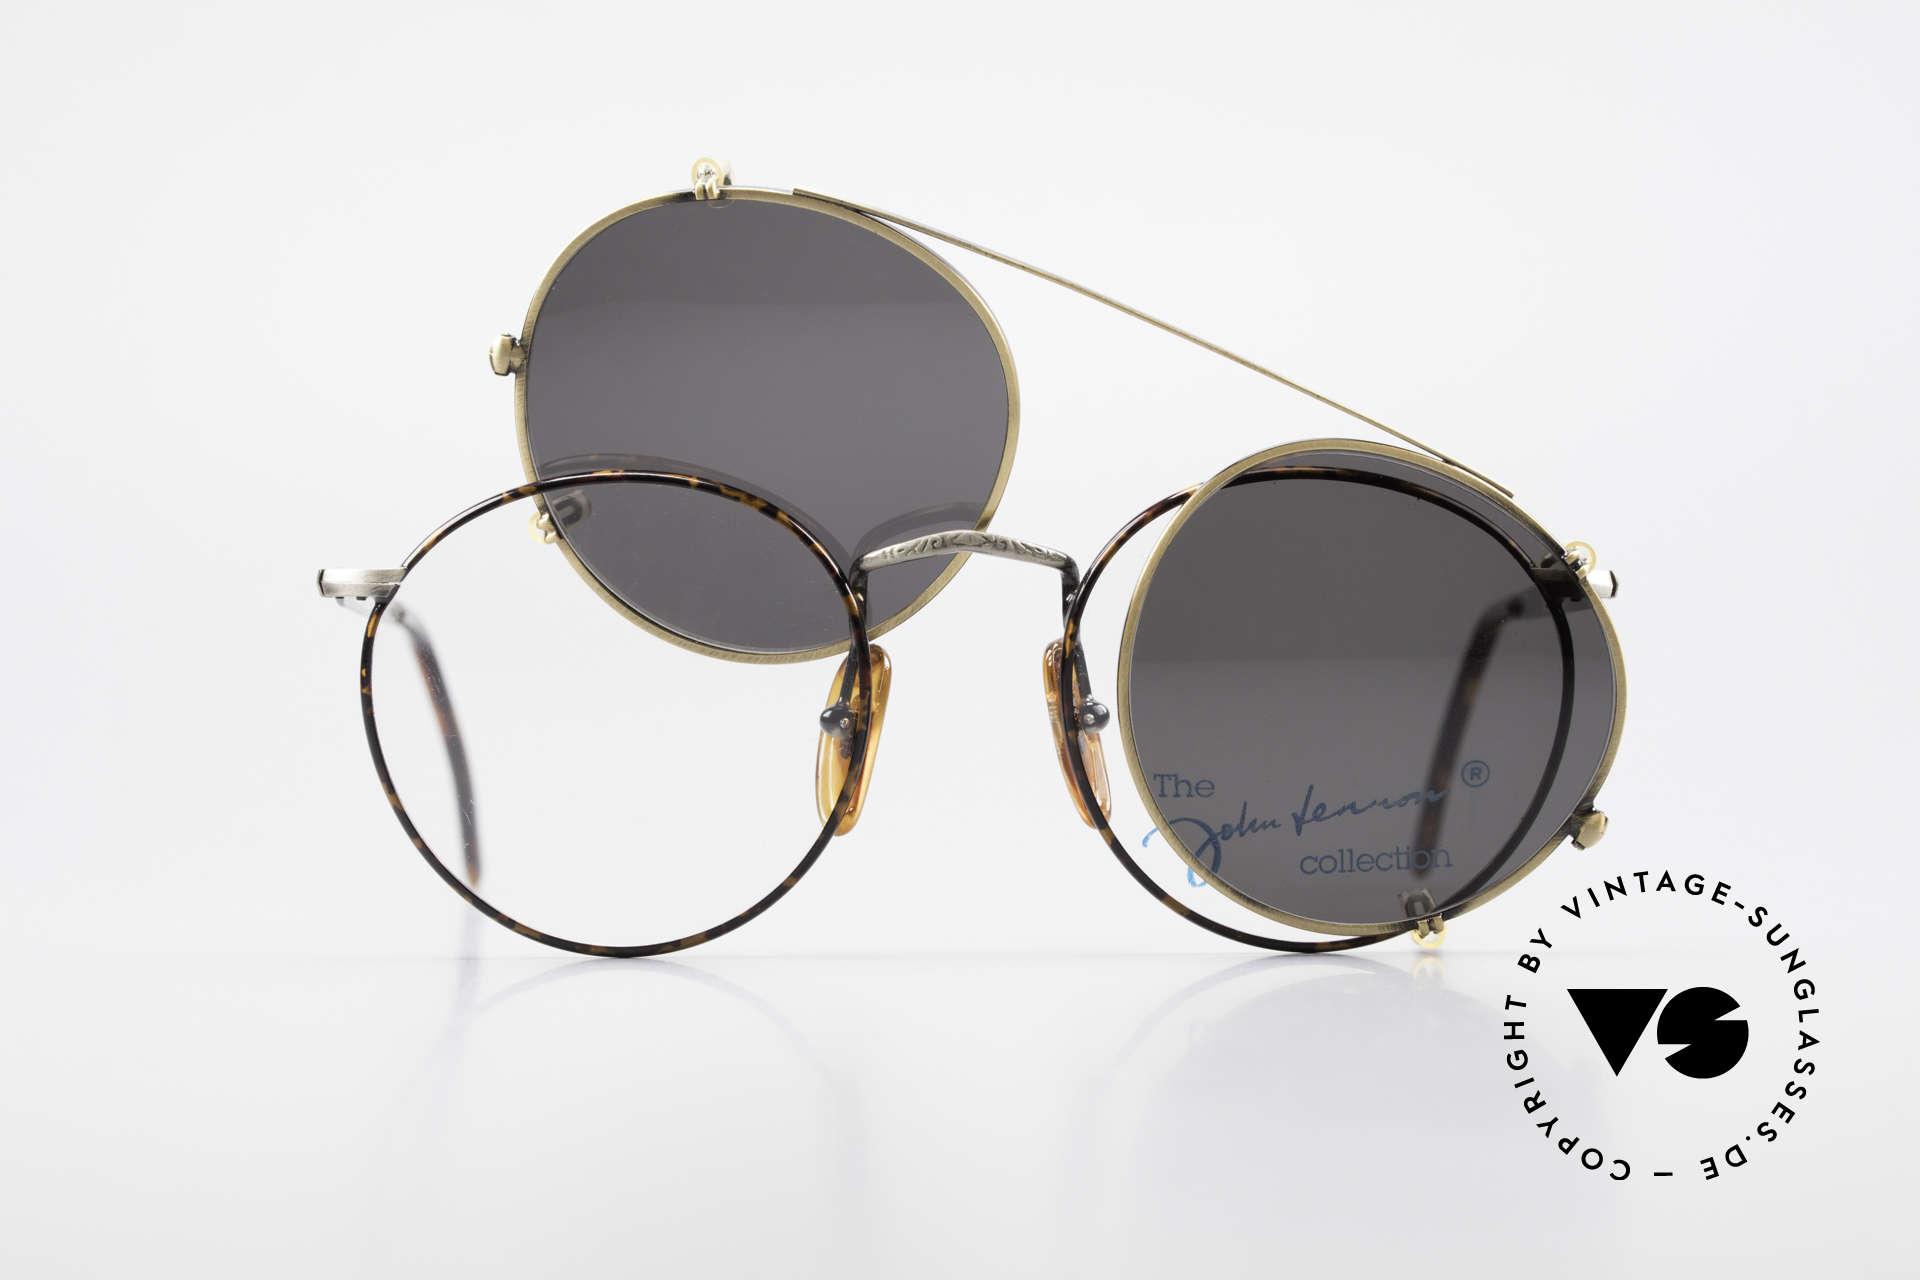 John Lennon - Imagine Panto Glasses With Clip On, NO RETRO PANTO SUNGLASSES; but a rare old ORIGINAL, Made for Men and Women